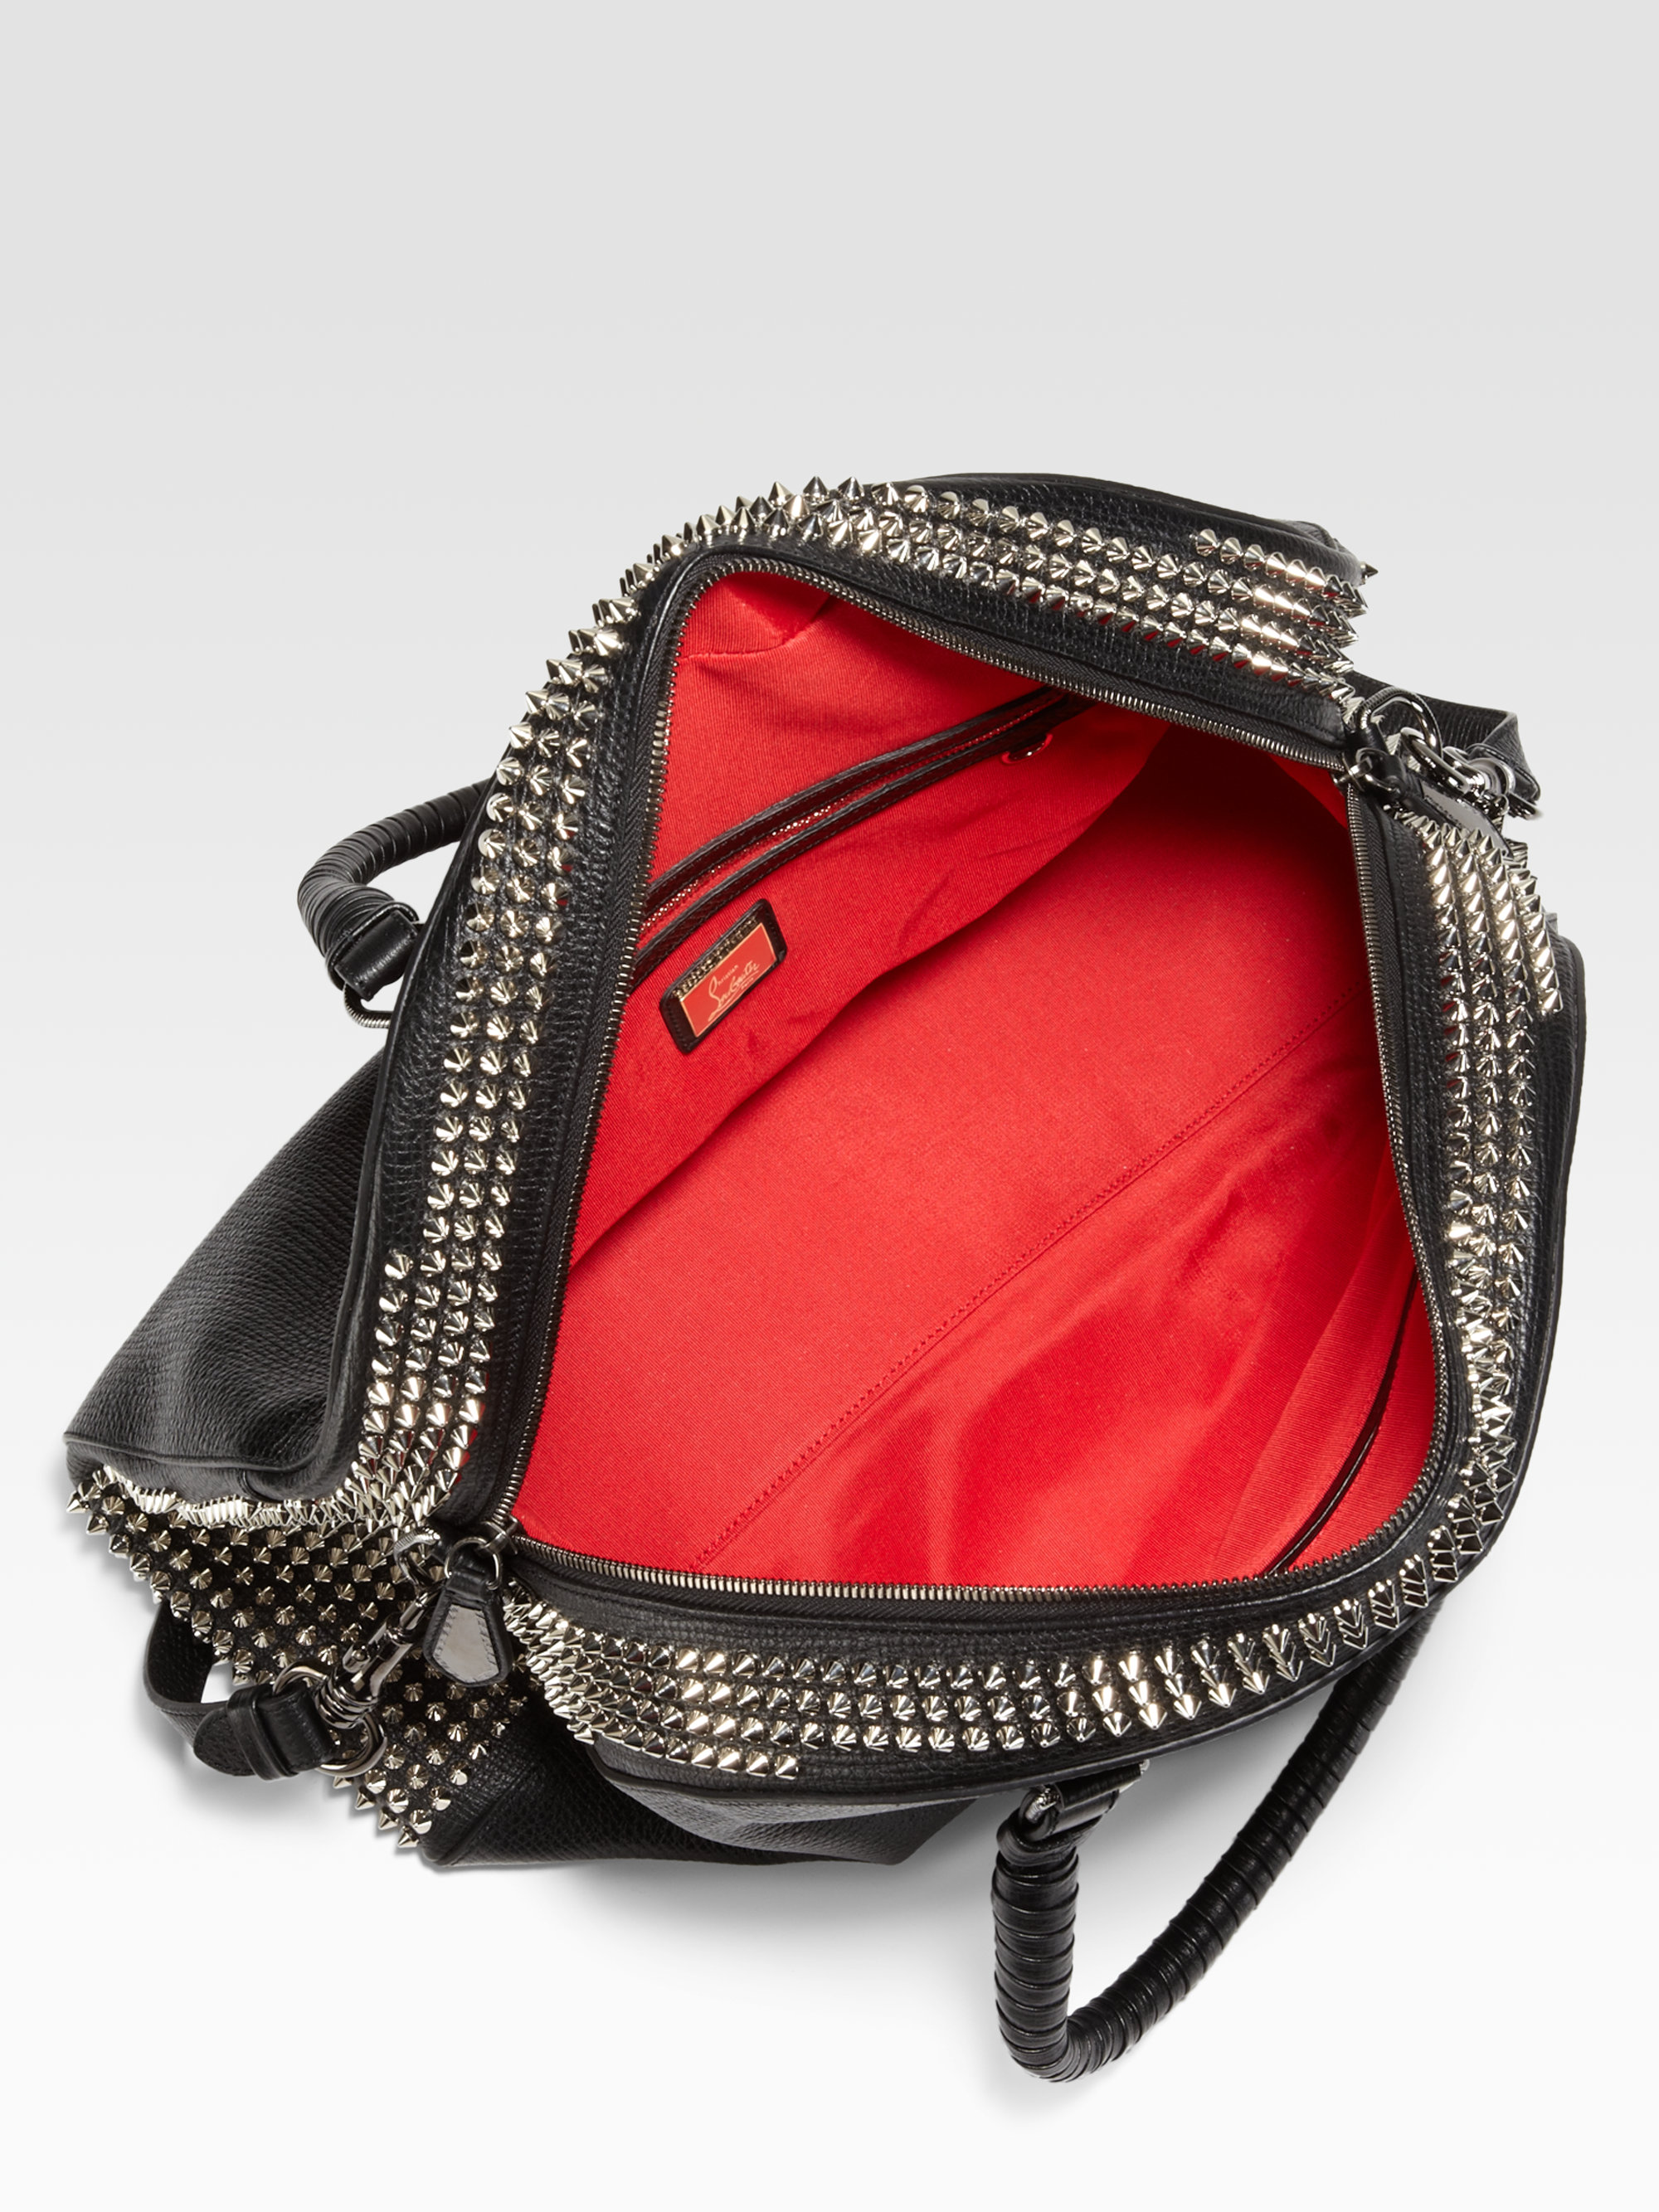 2f158a809cf Christian Louboutin Black Panettone Large Studded Shopping Bag